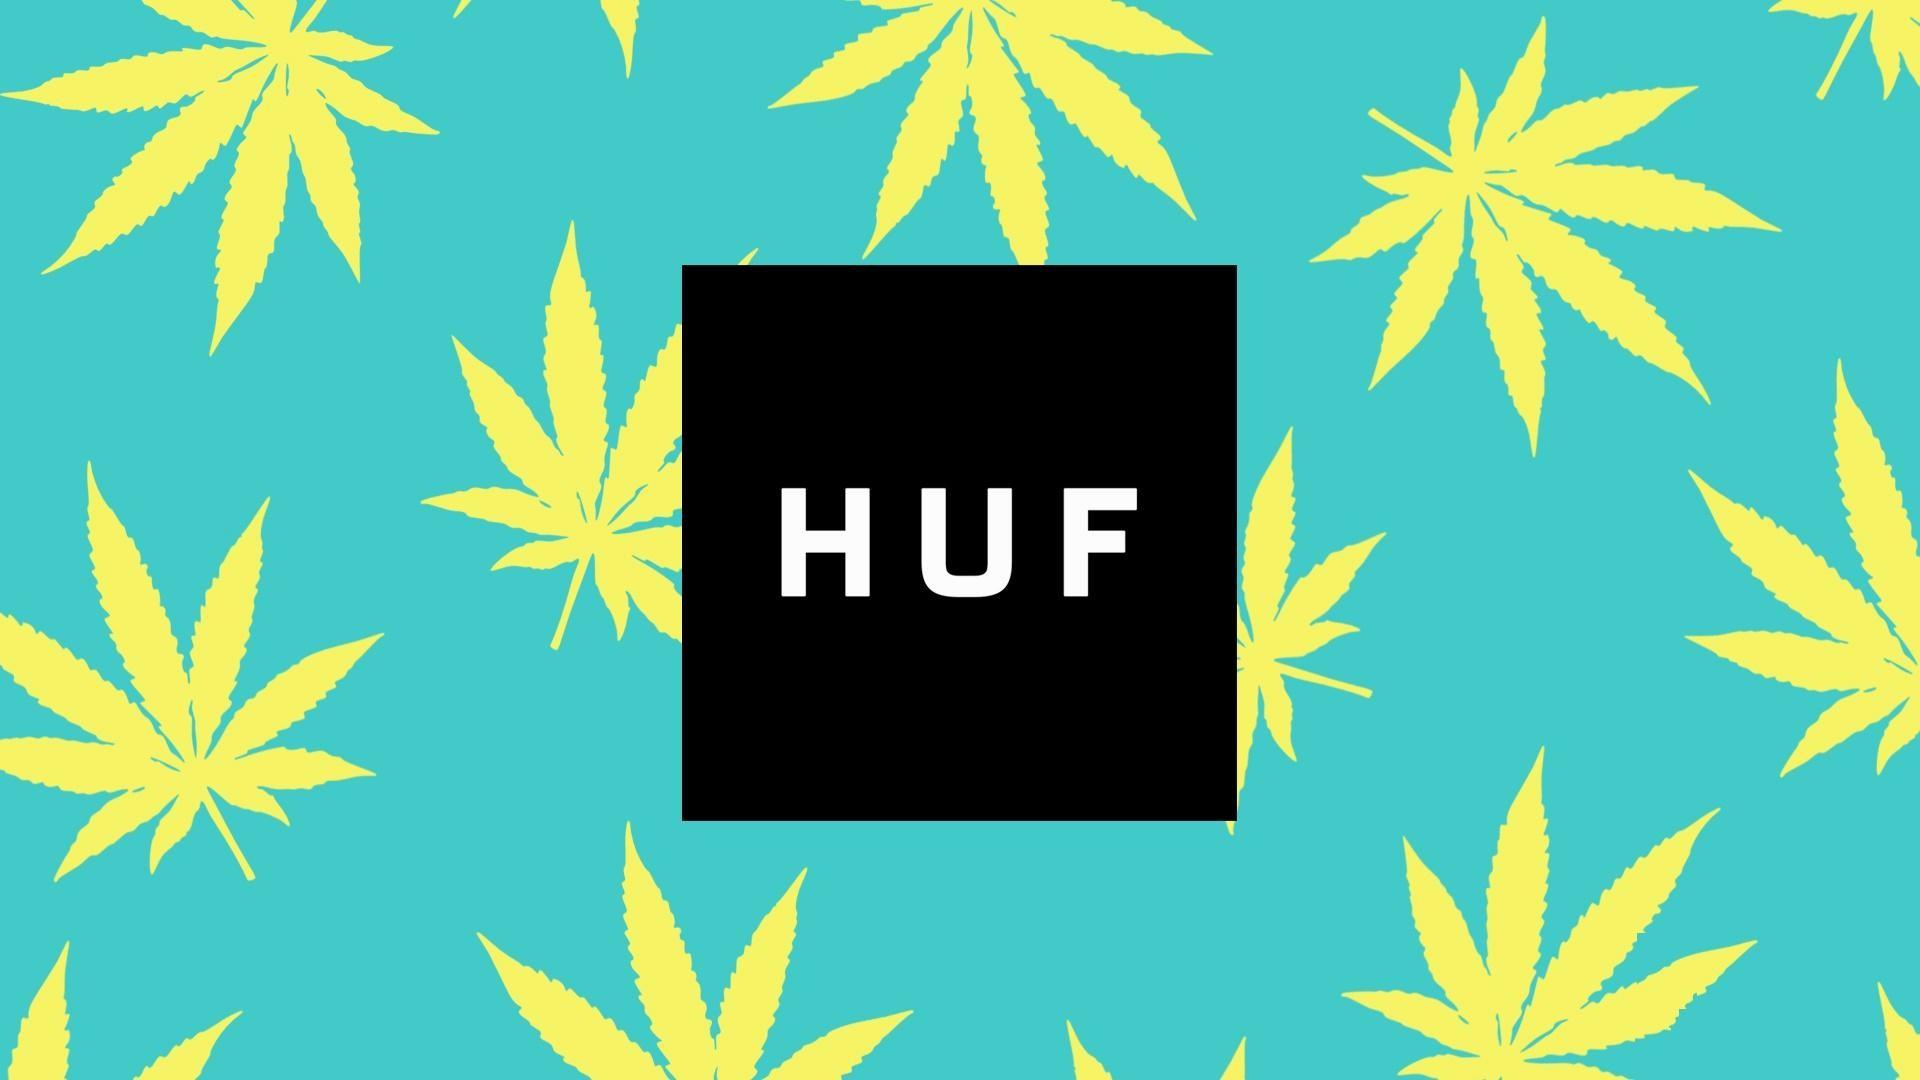 Wallpapers-HD-diamond-supply-co-x-huf